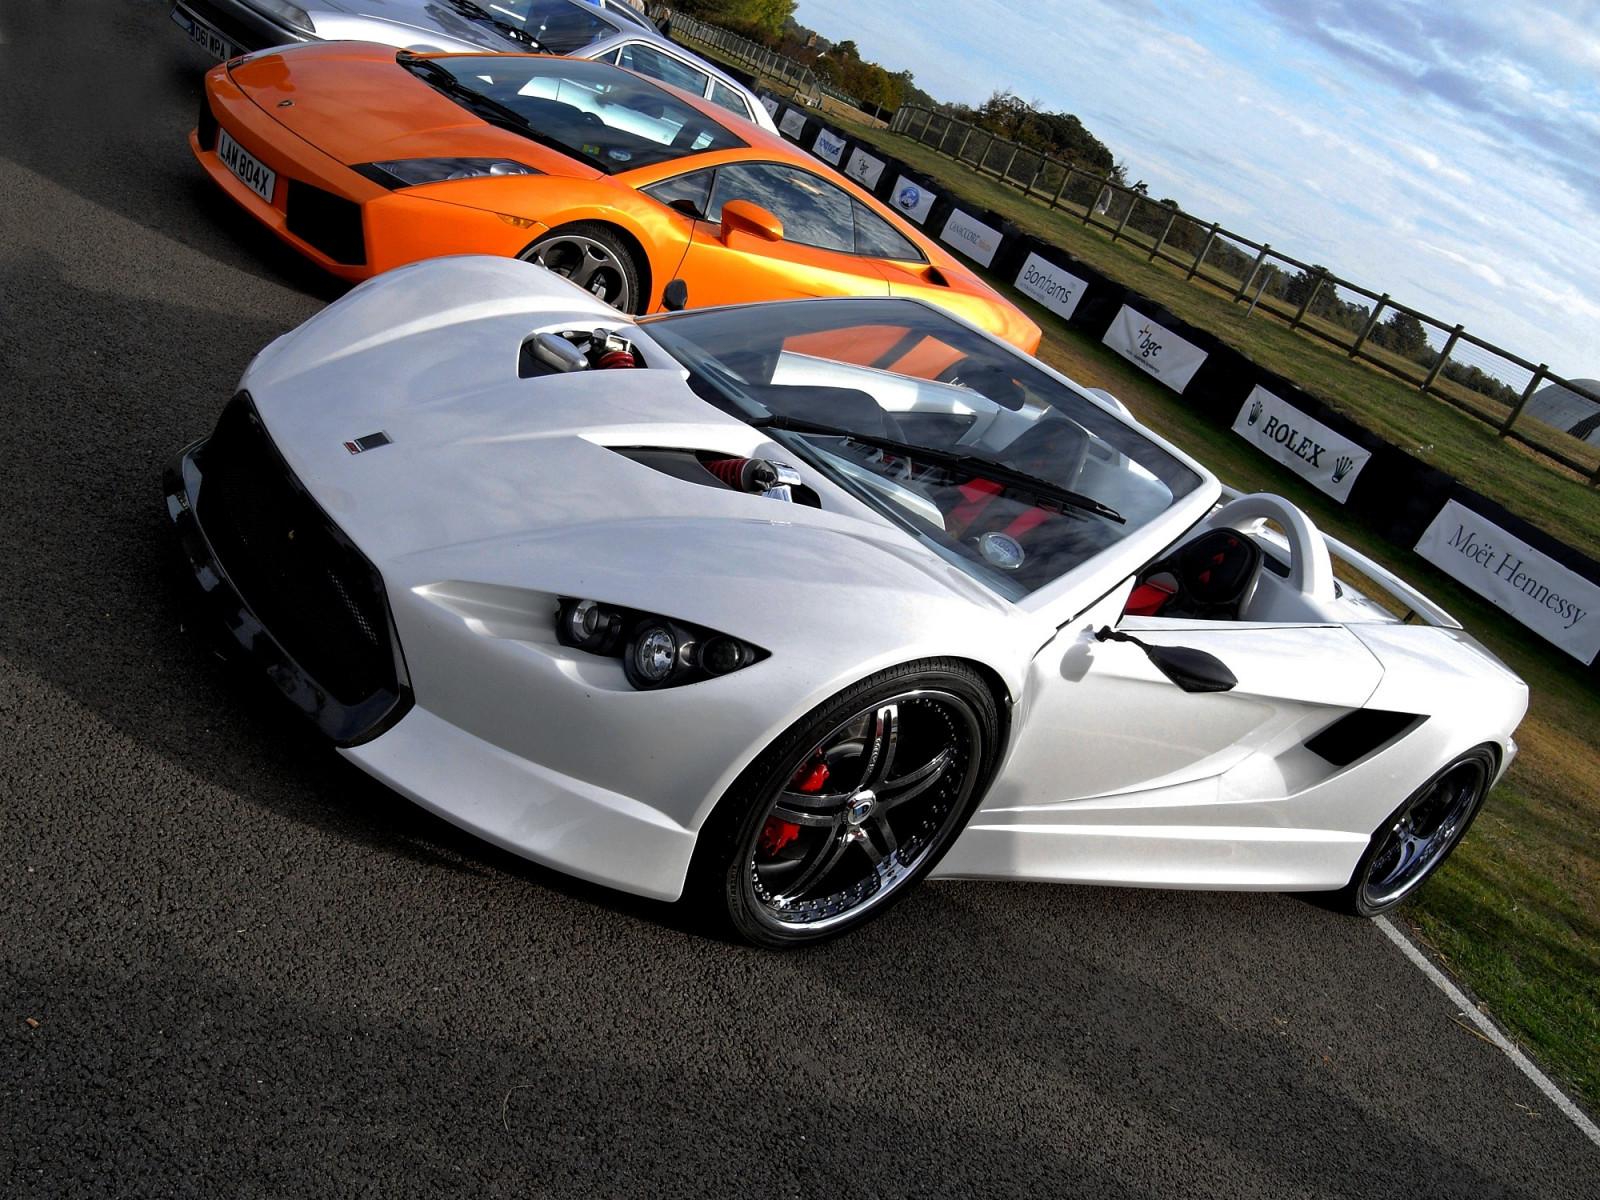 Картинки спортивных машинах